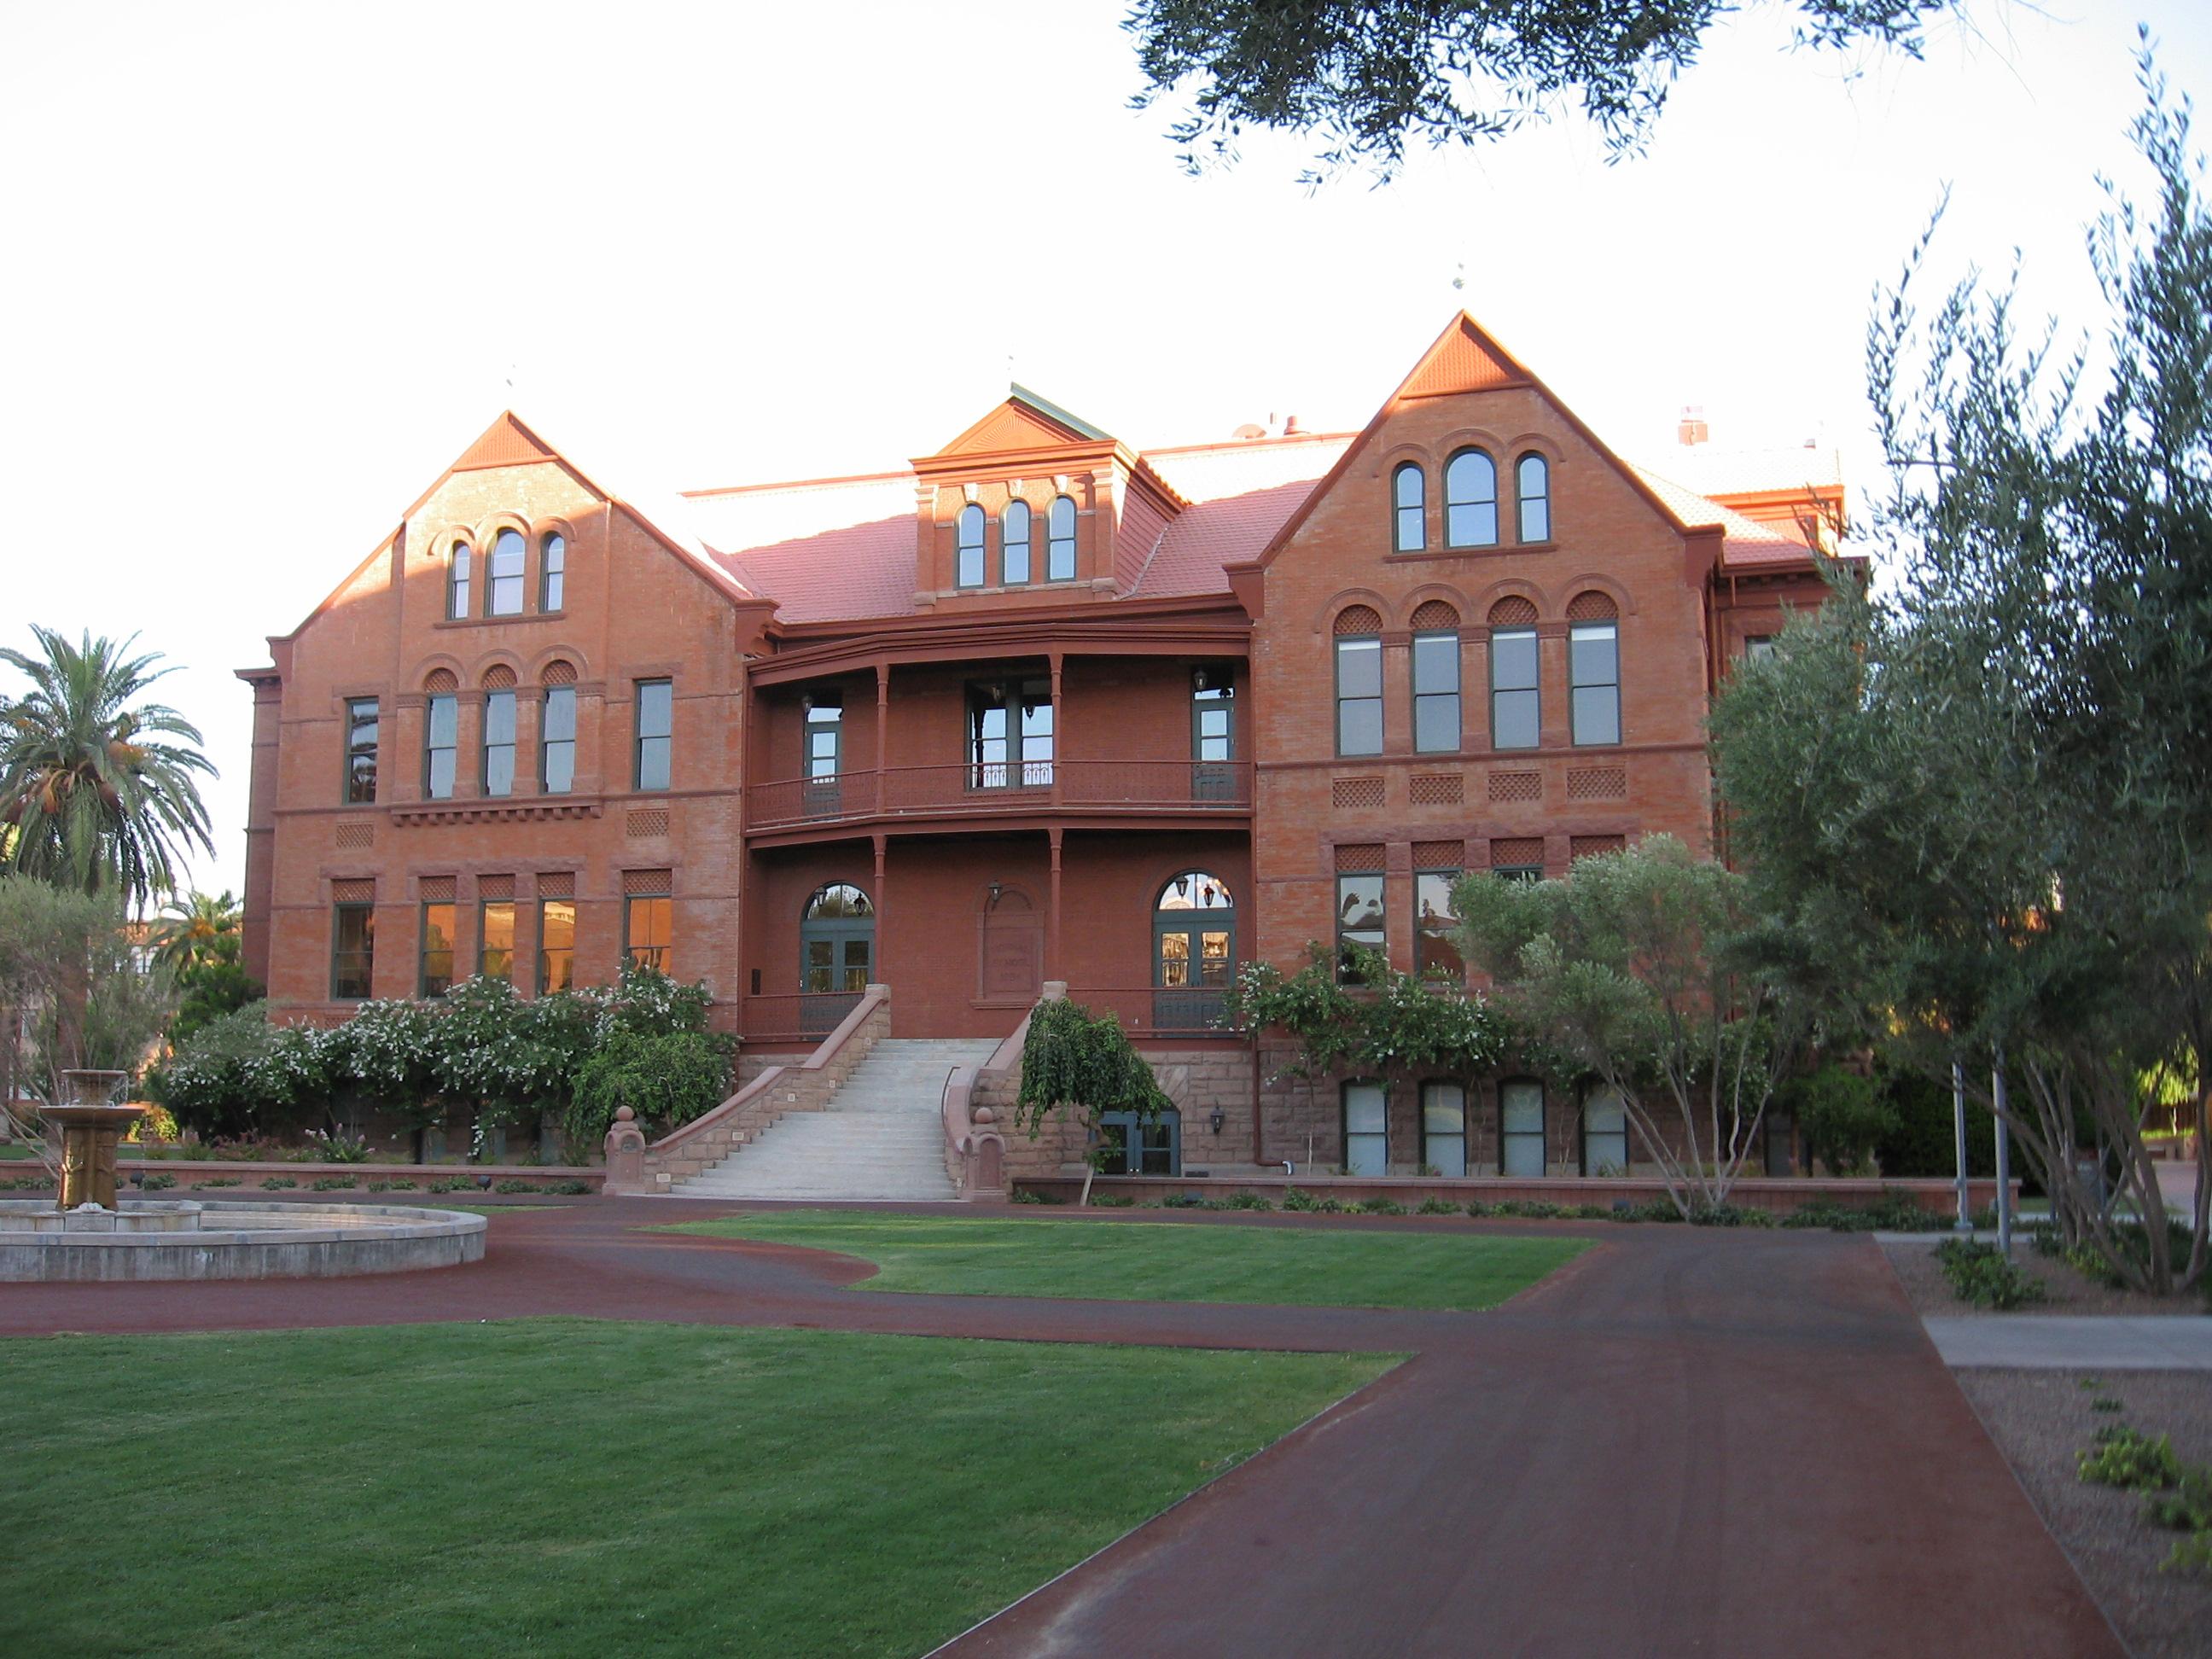 Arizona State University (ASU)